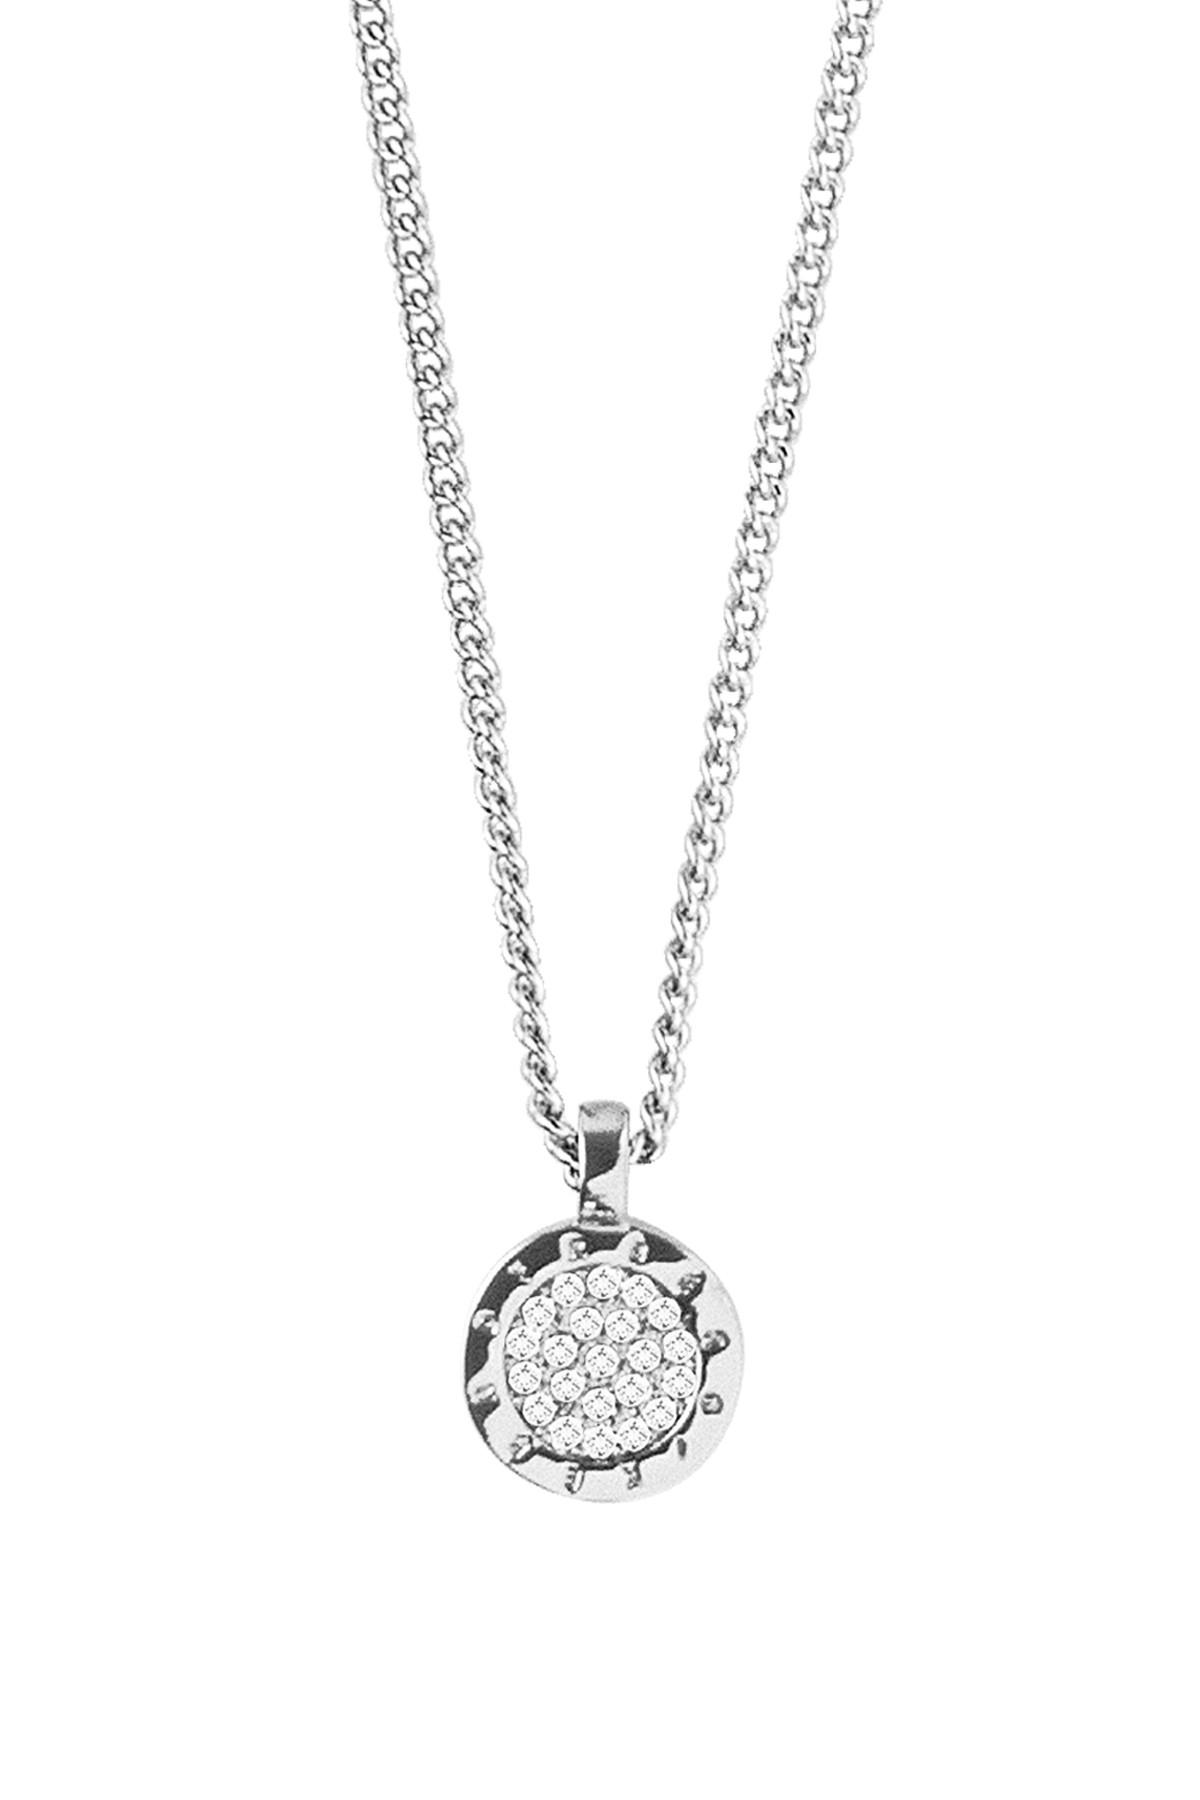 Image of   DYRBERG/KERN ALIA HALSKÆDE 350866 (Silver, Crystal, ONESIZE)